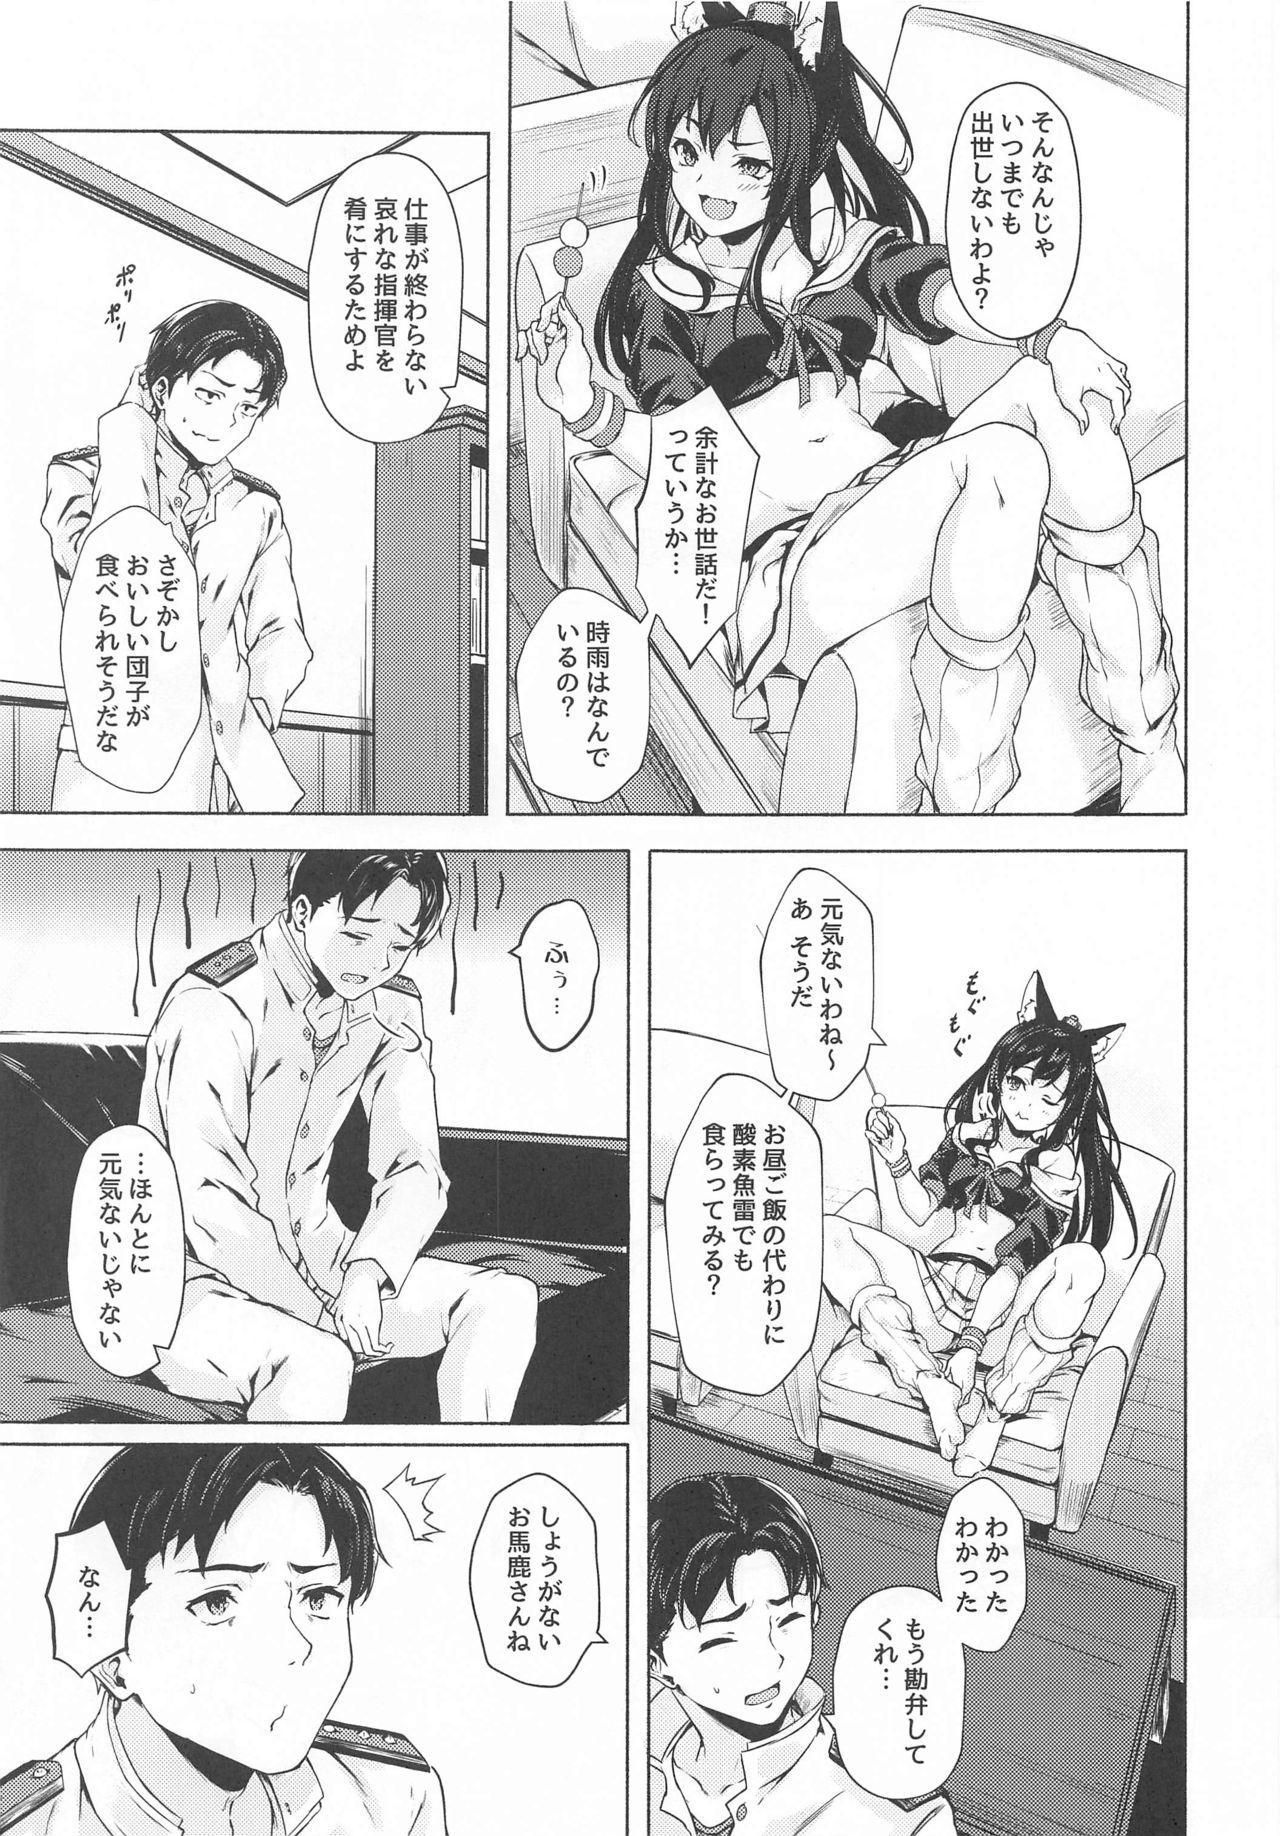 Baka Shikikan no Osewa 3